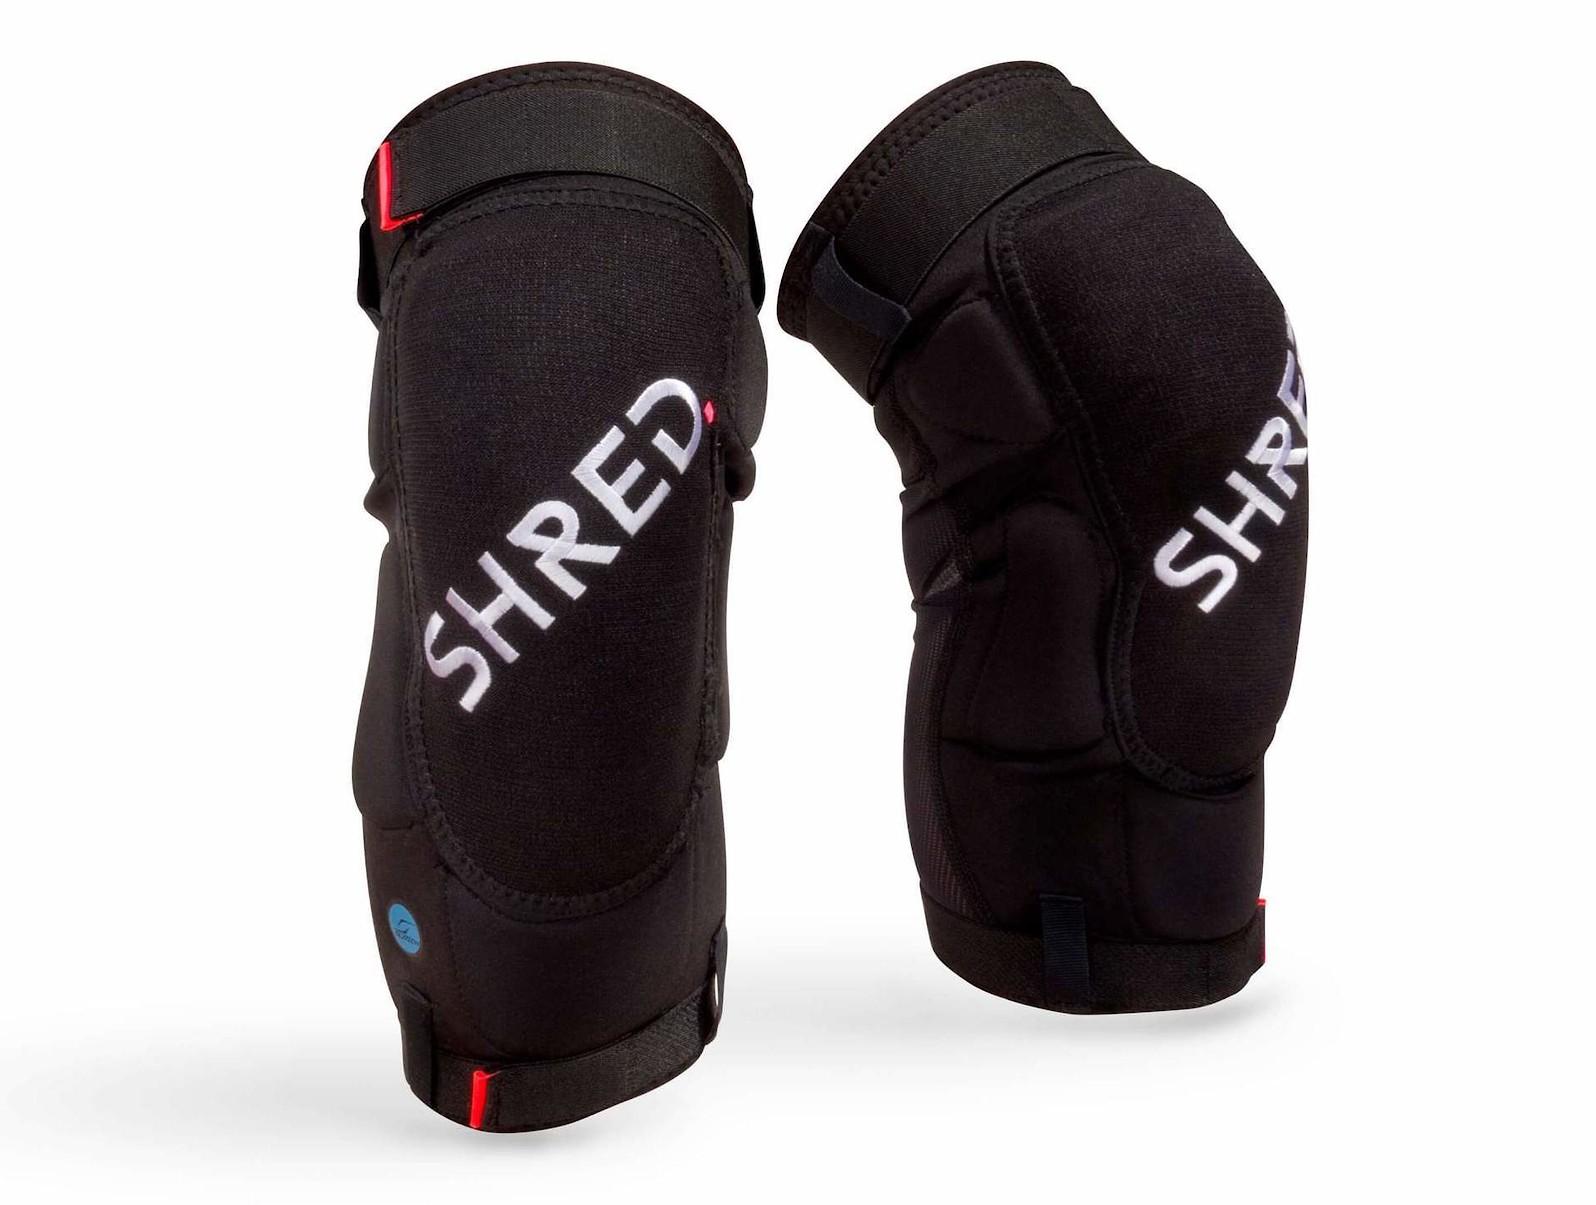 SHRED. NoShock Heavy Duty Knee Pad